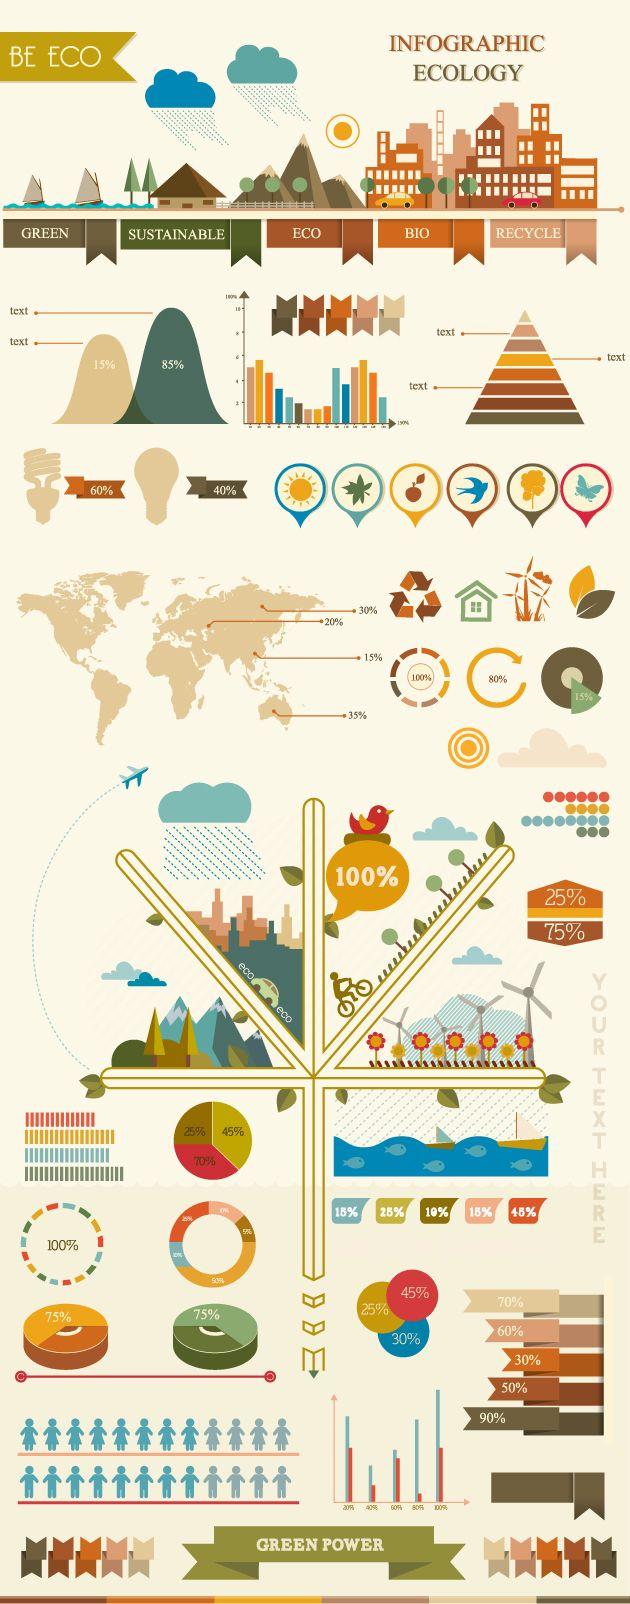 designtnt vectors infographic ecology Eco Infographic